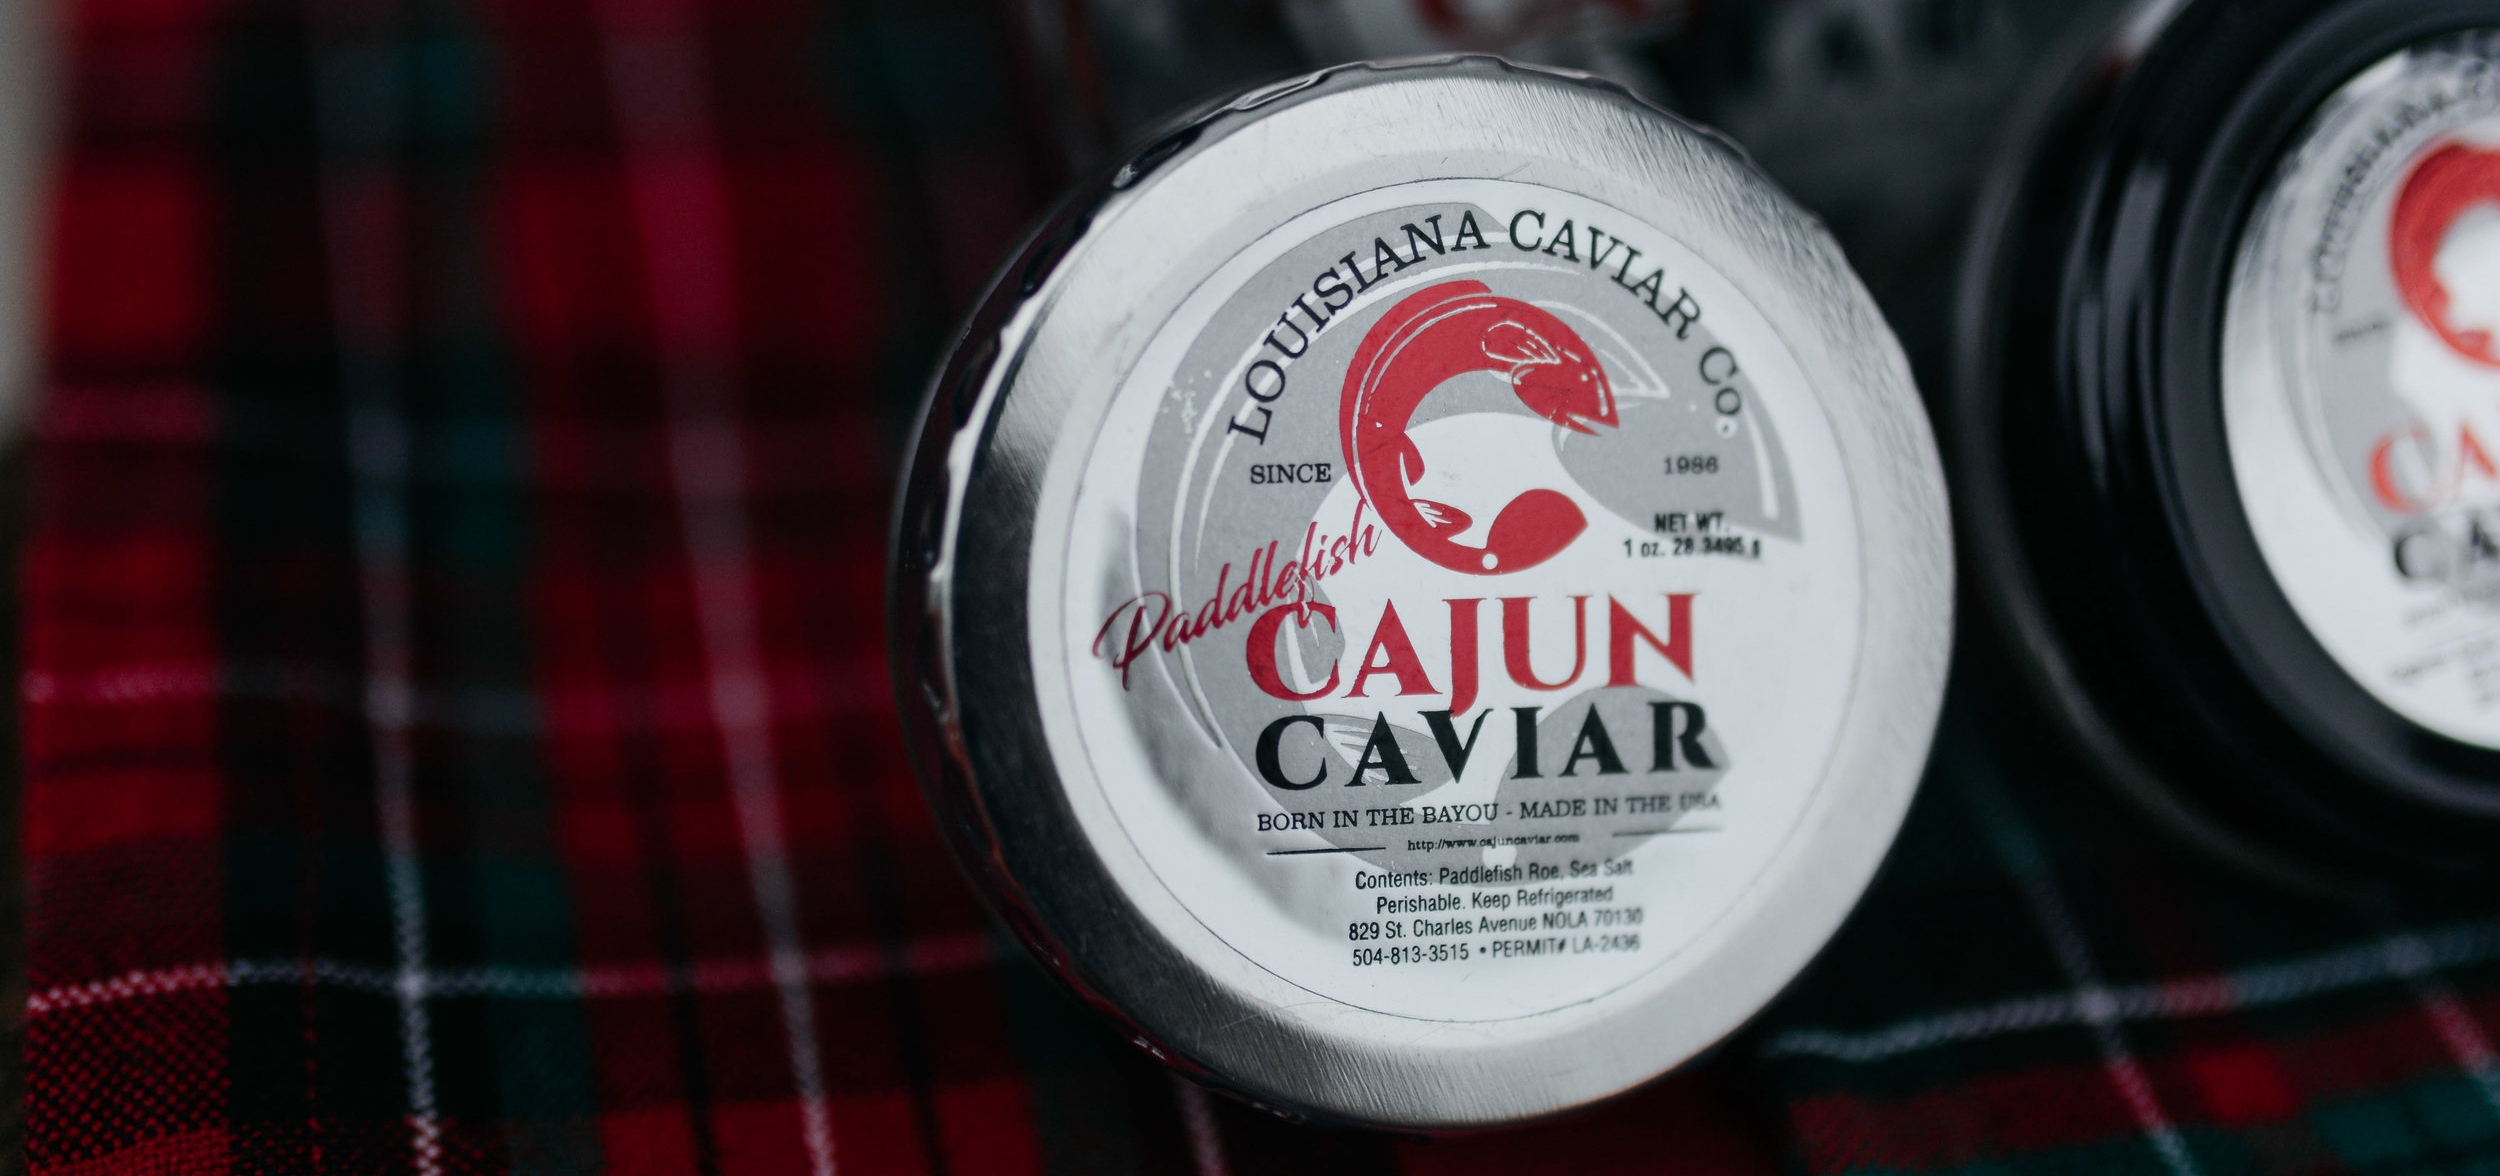 cajun-caviar-can.jpg